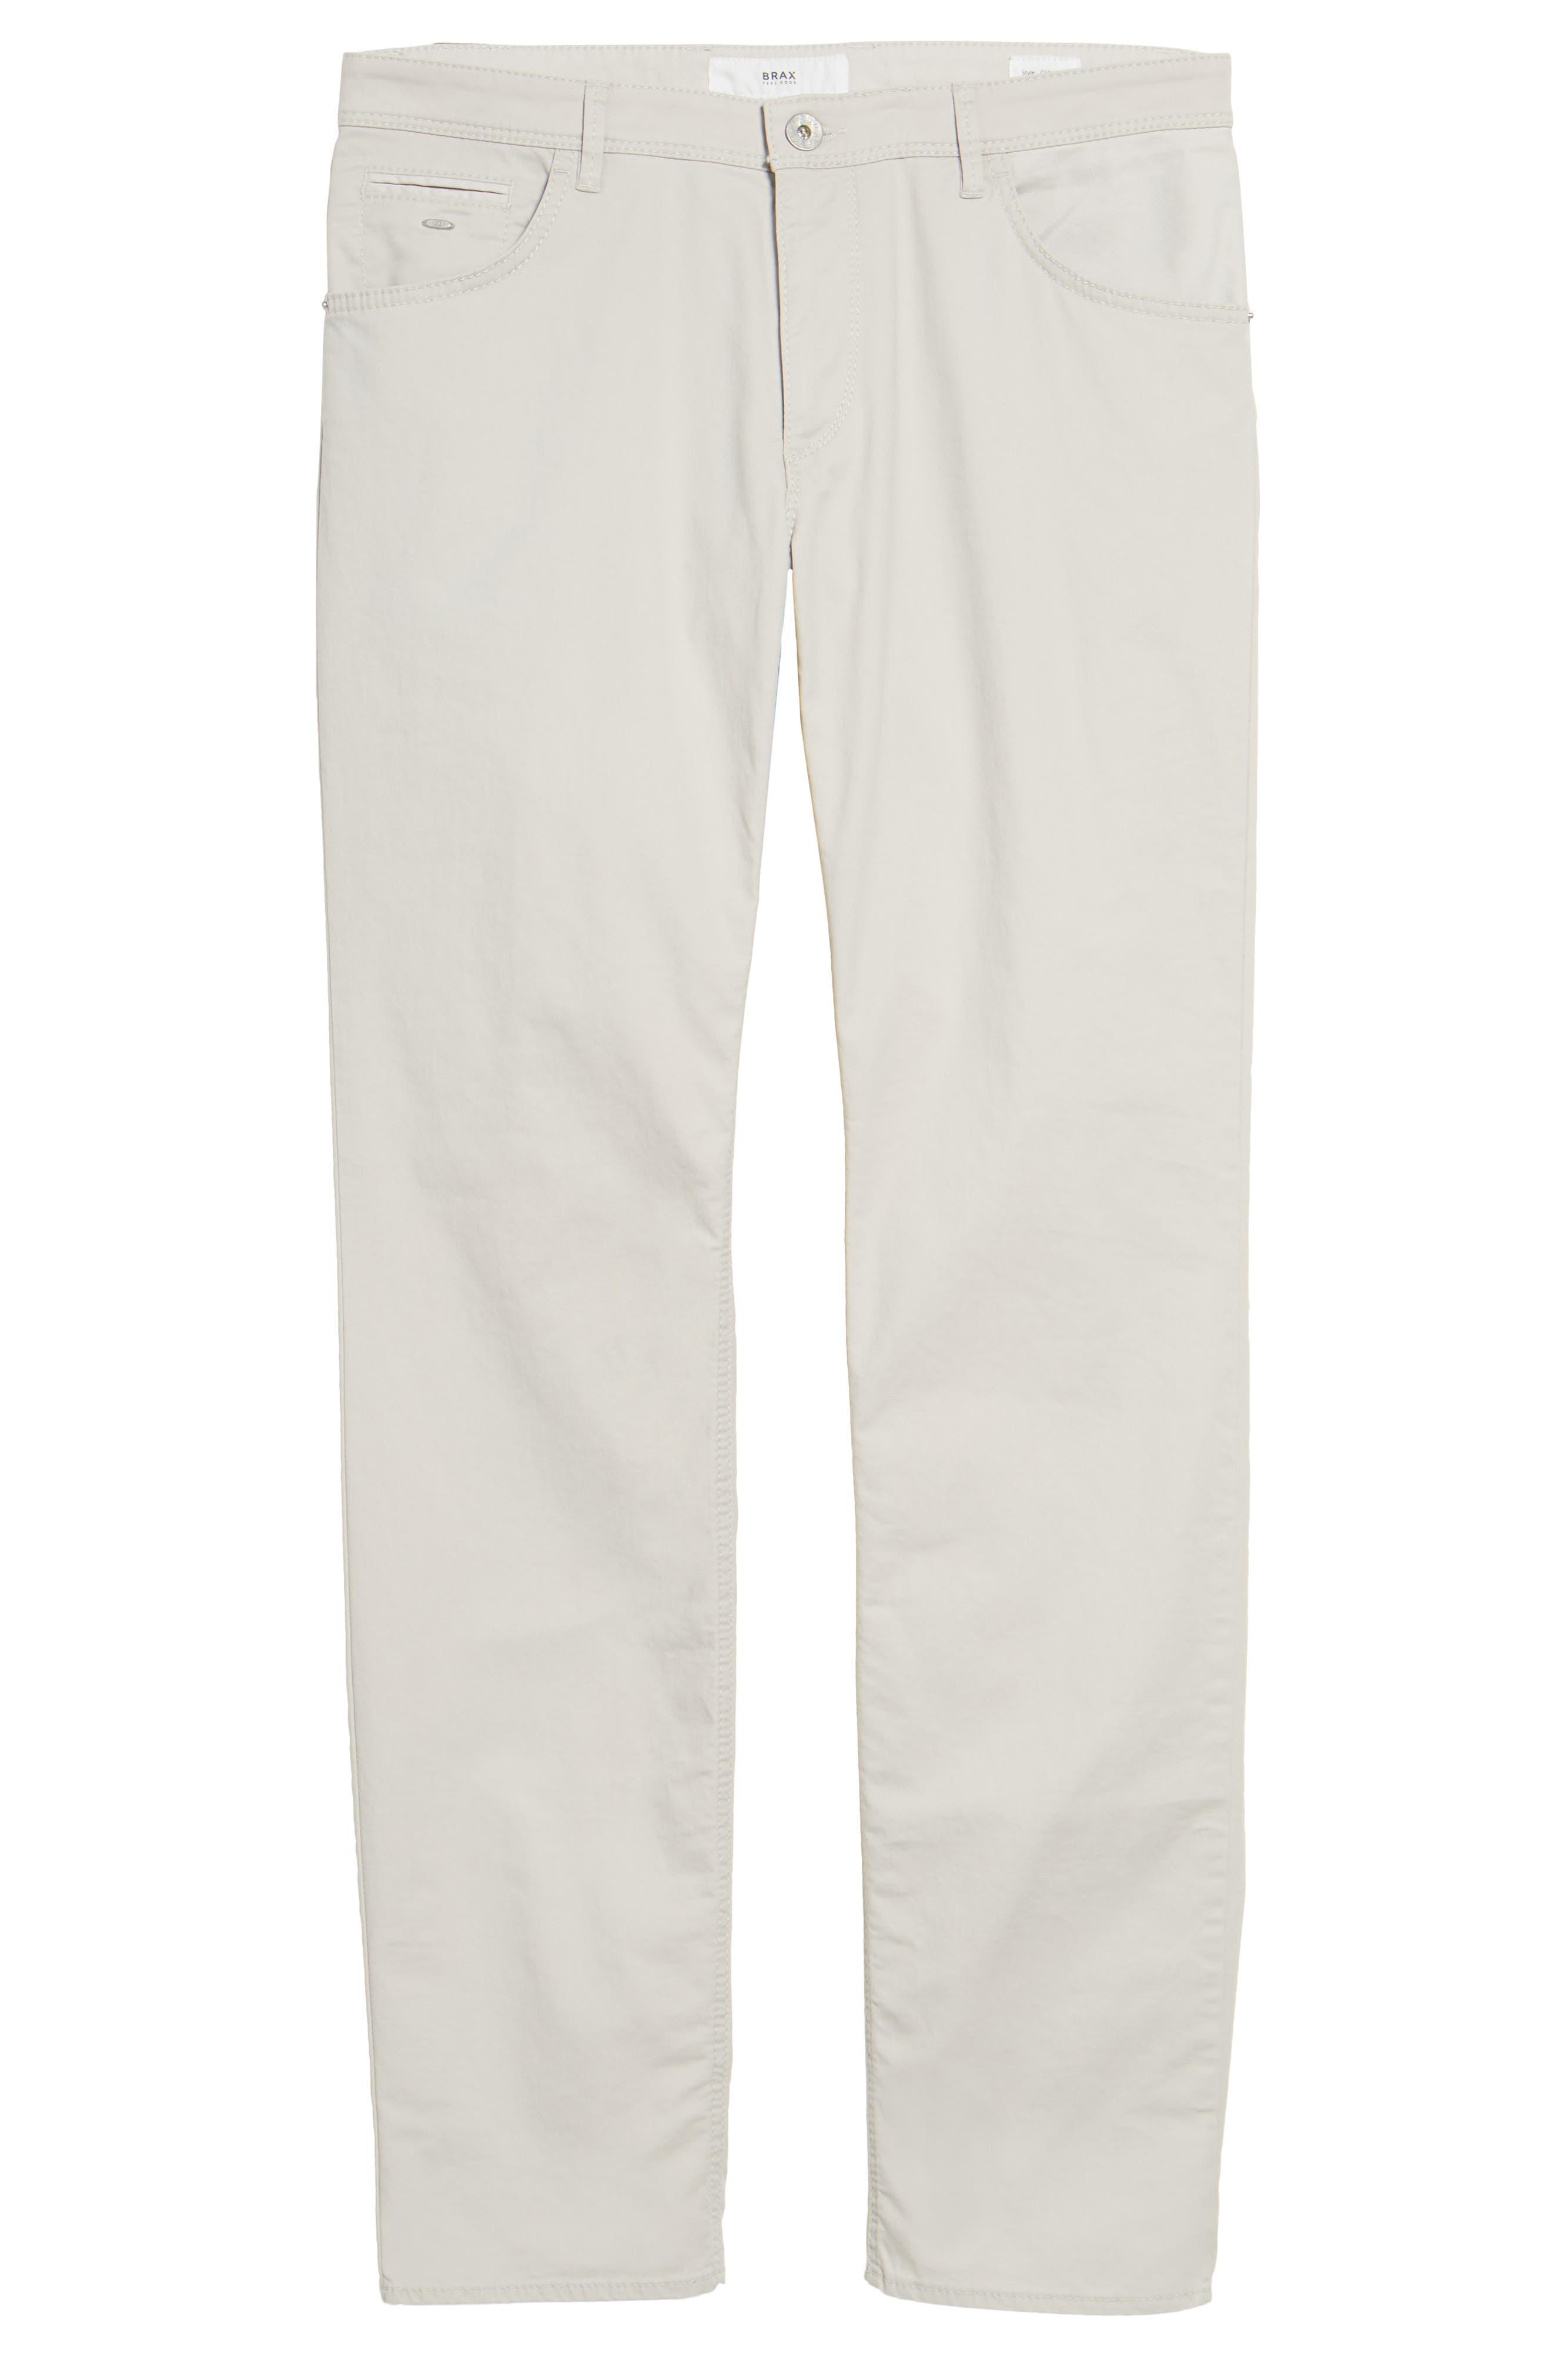 Chuck Flat Front Stretch Cotton Pants,                             Alternate thumbnail 6, color,                             250